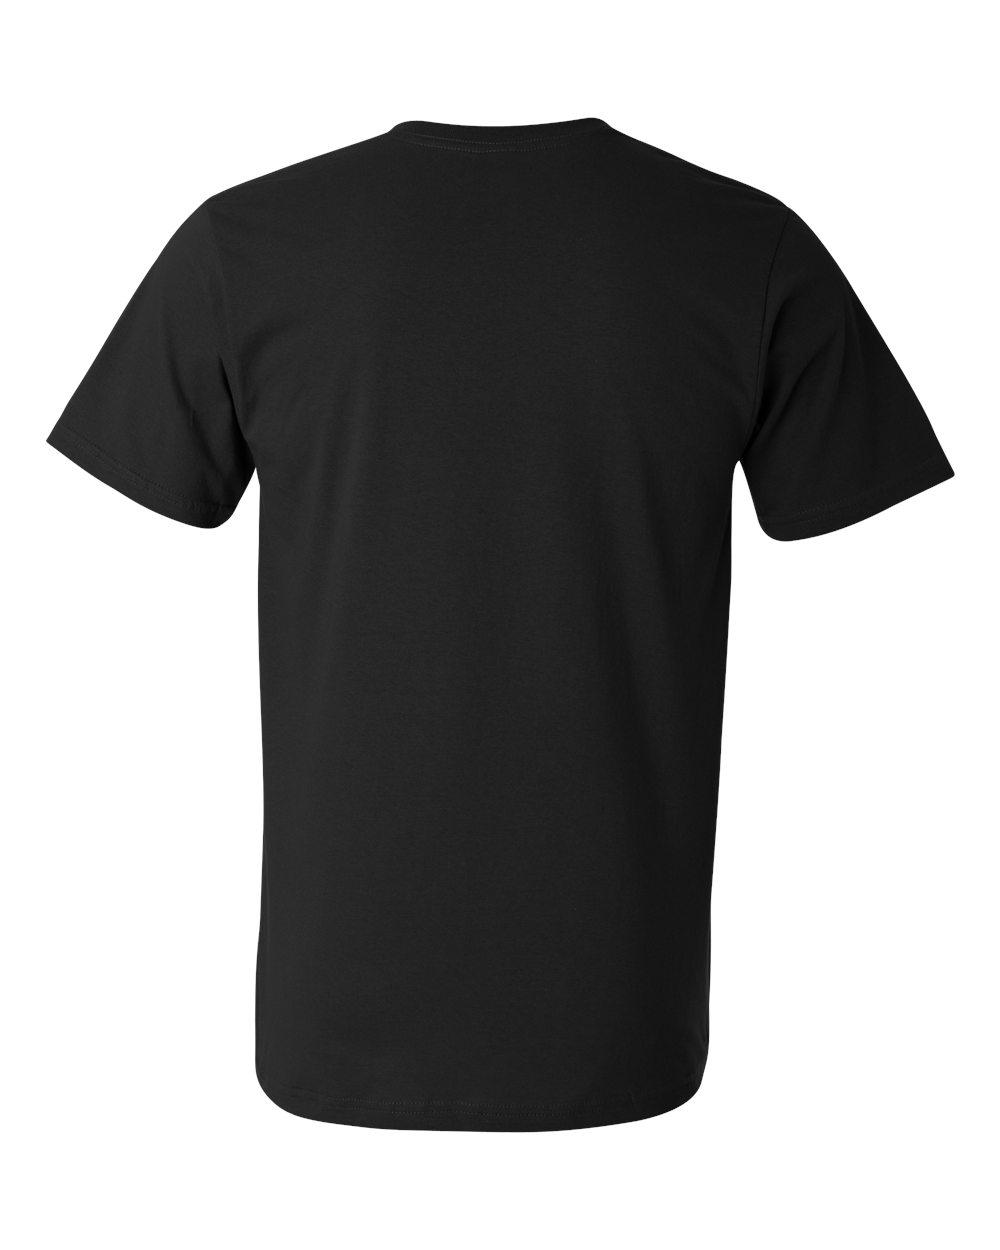 Anvil-Men-039-s-Lightweight-V-Neck-T-Shirt-982-S-3XL thumbnail 28